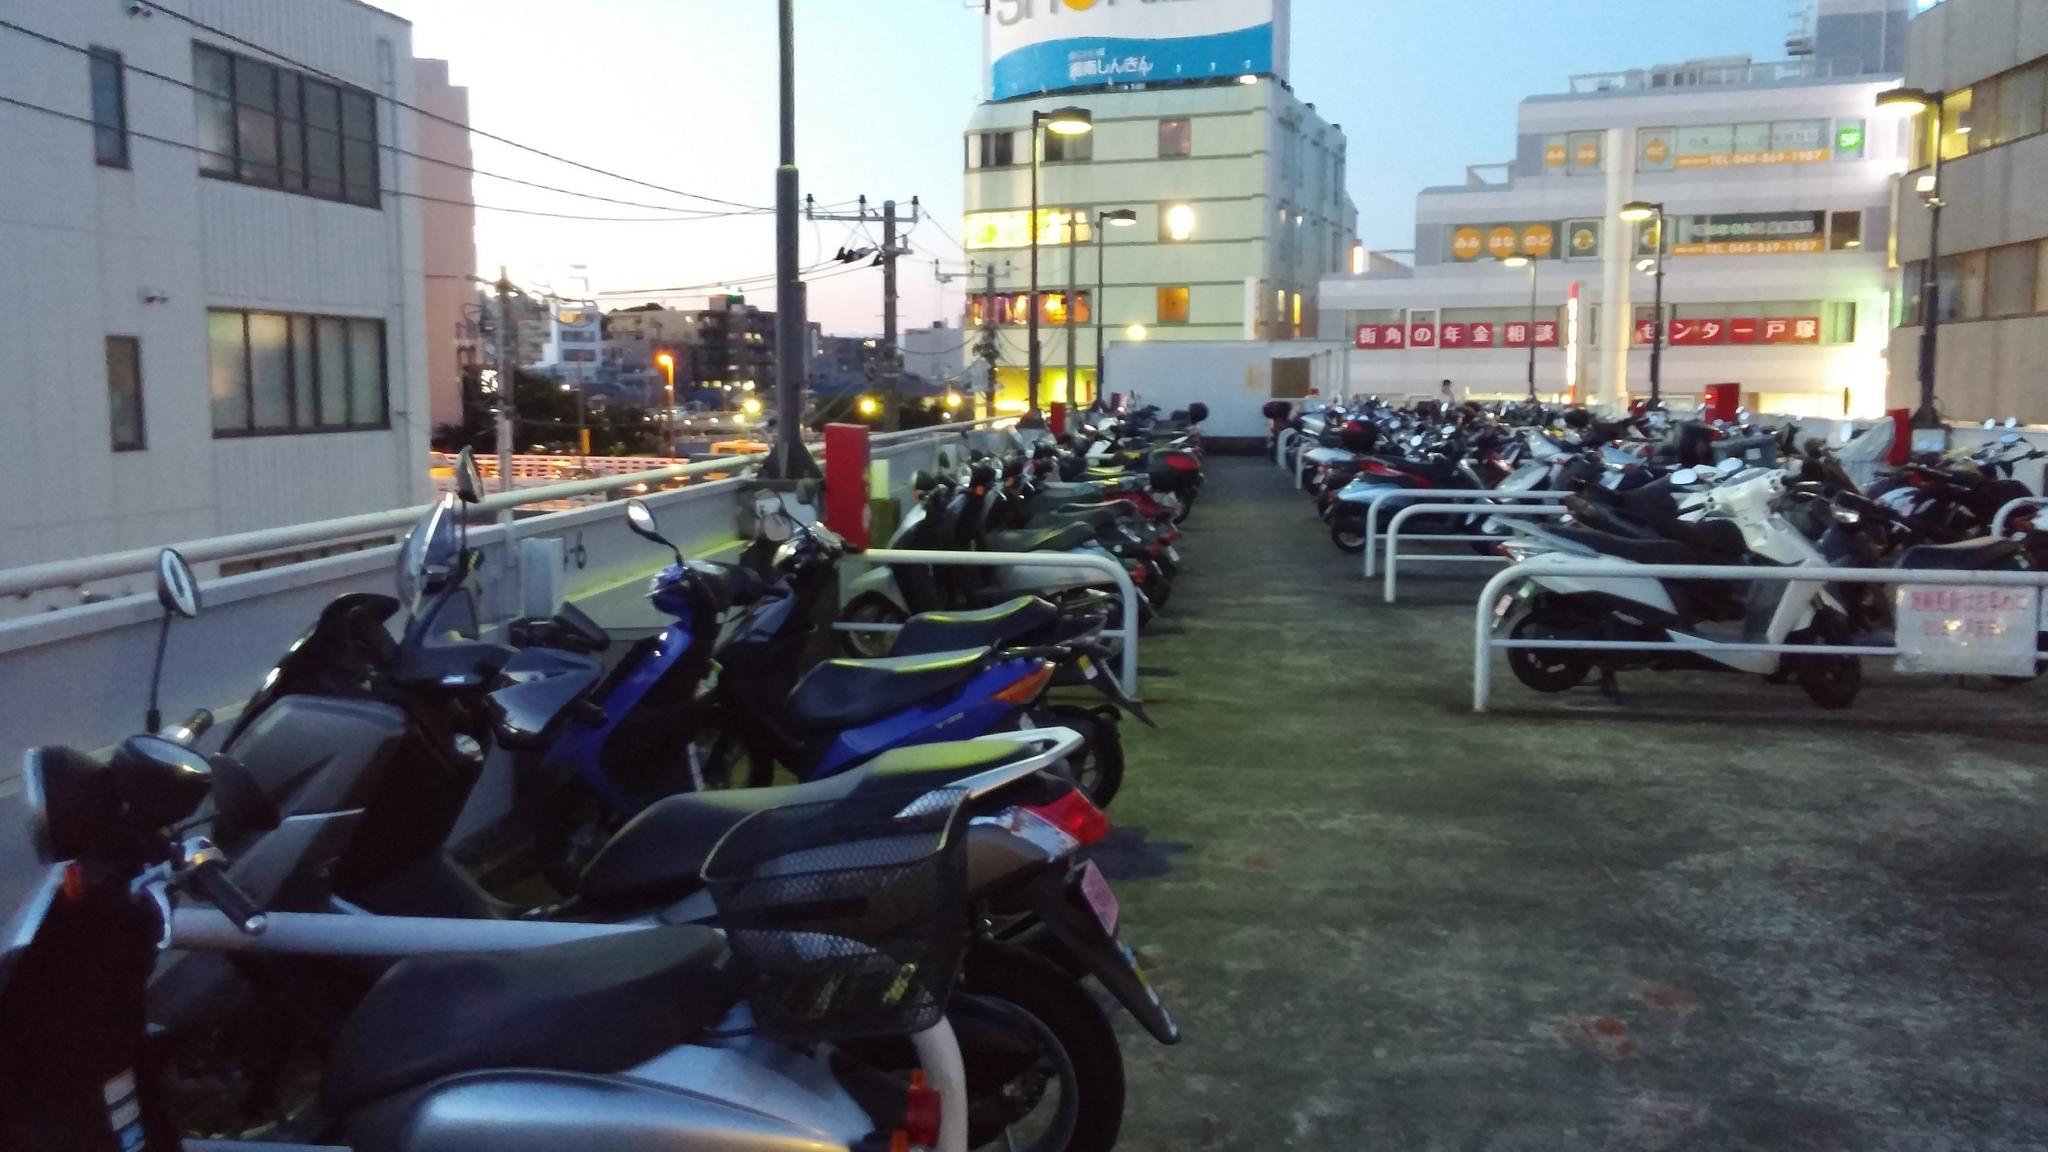 f:id:ToshUeno:20160729190935j:plain